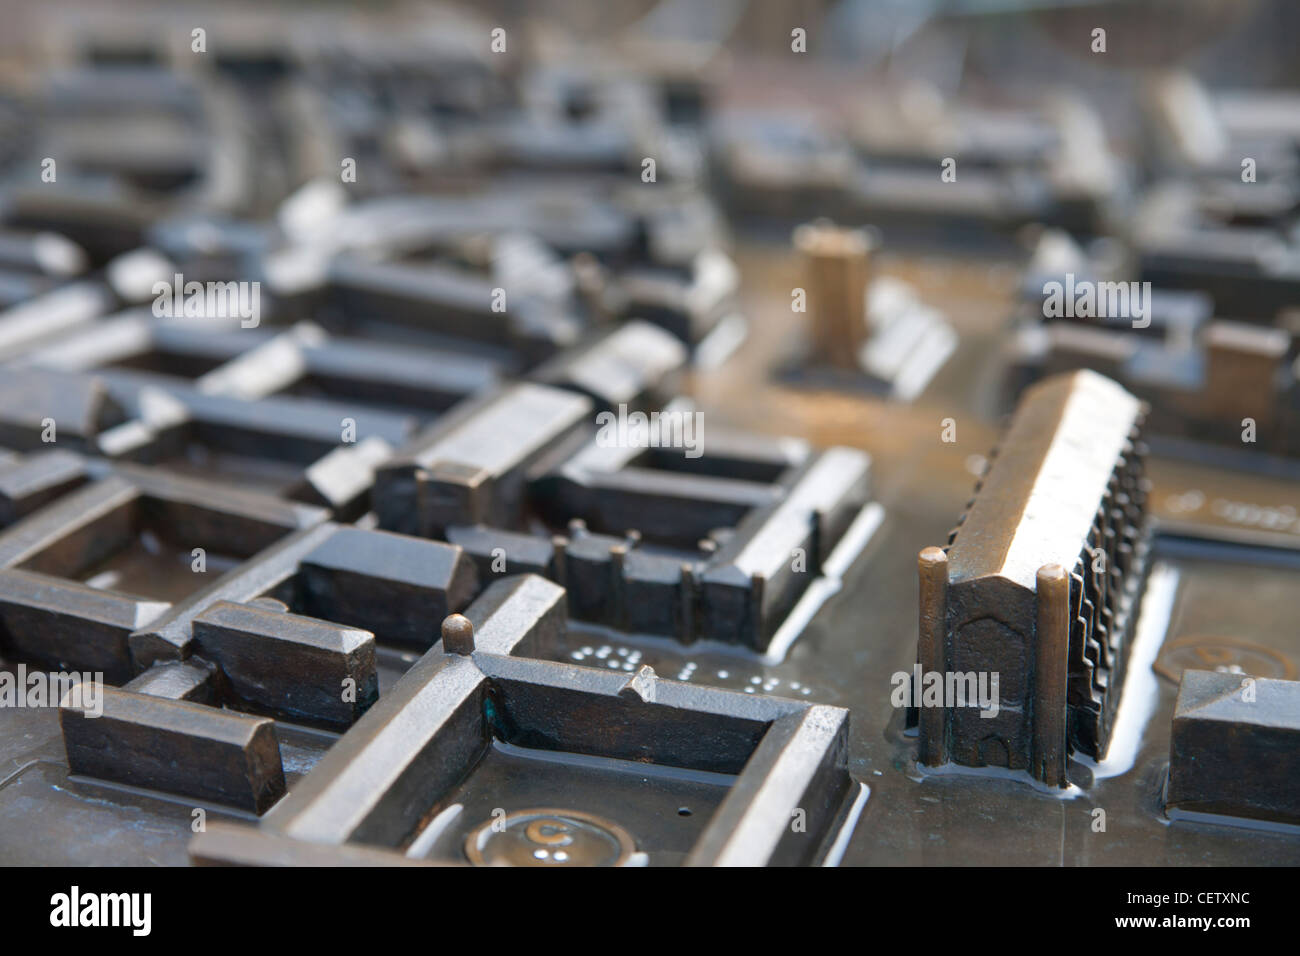 Sculpture miniature model Cambridge Kings Parade - Stock Image